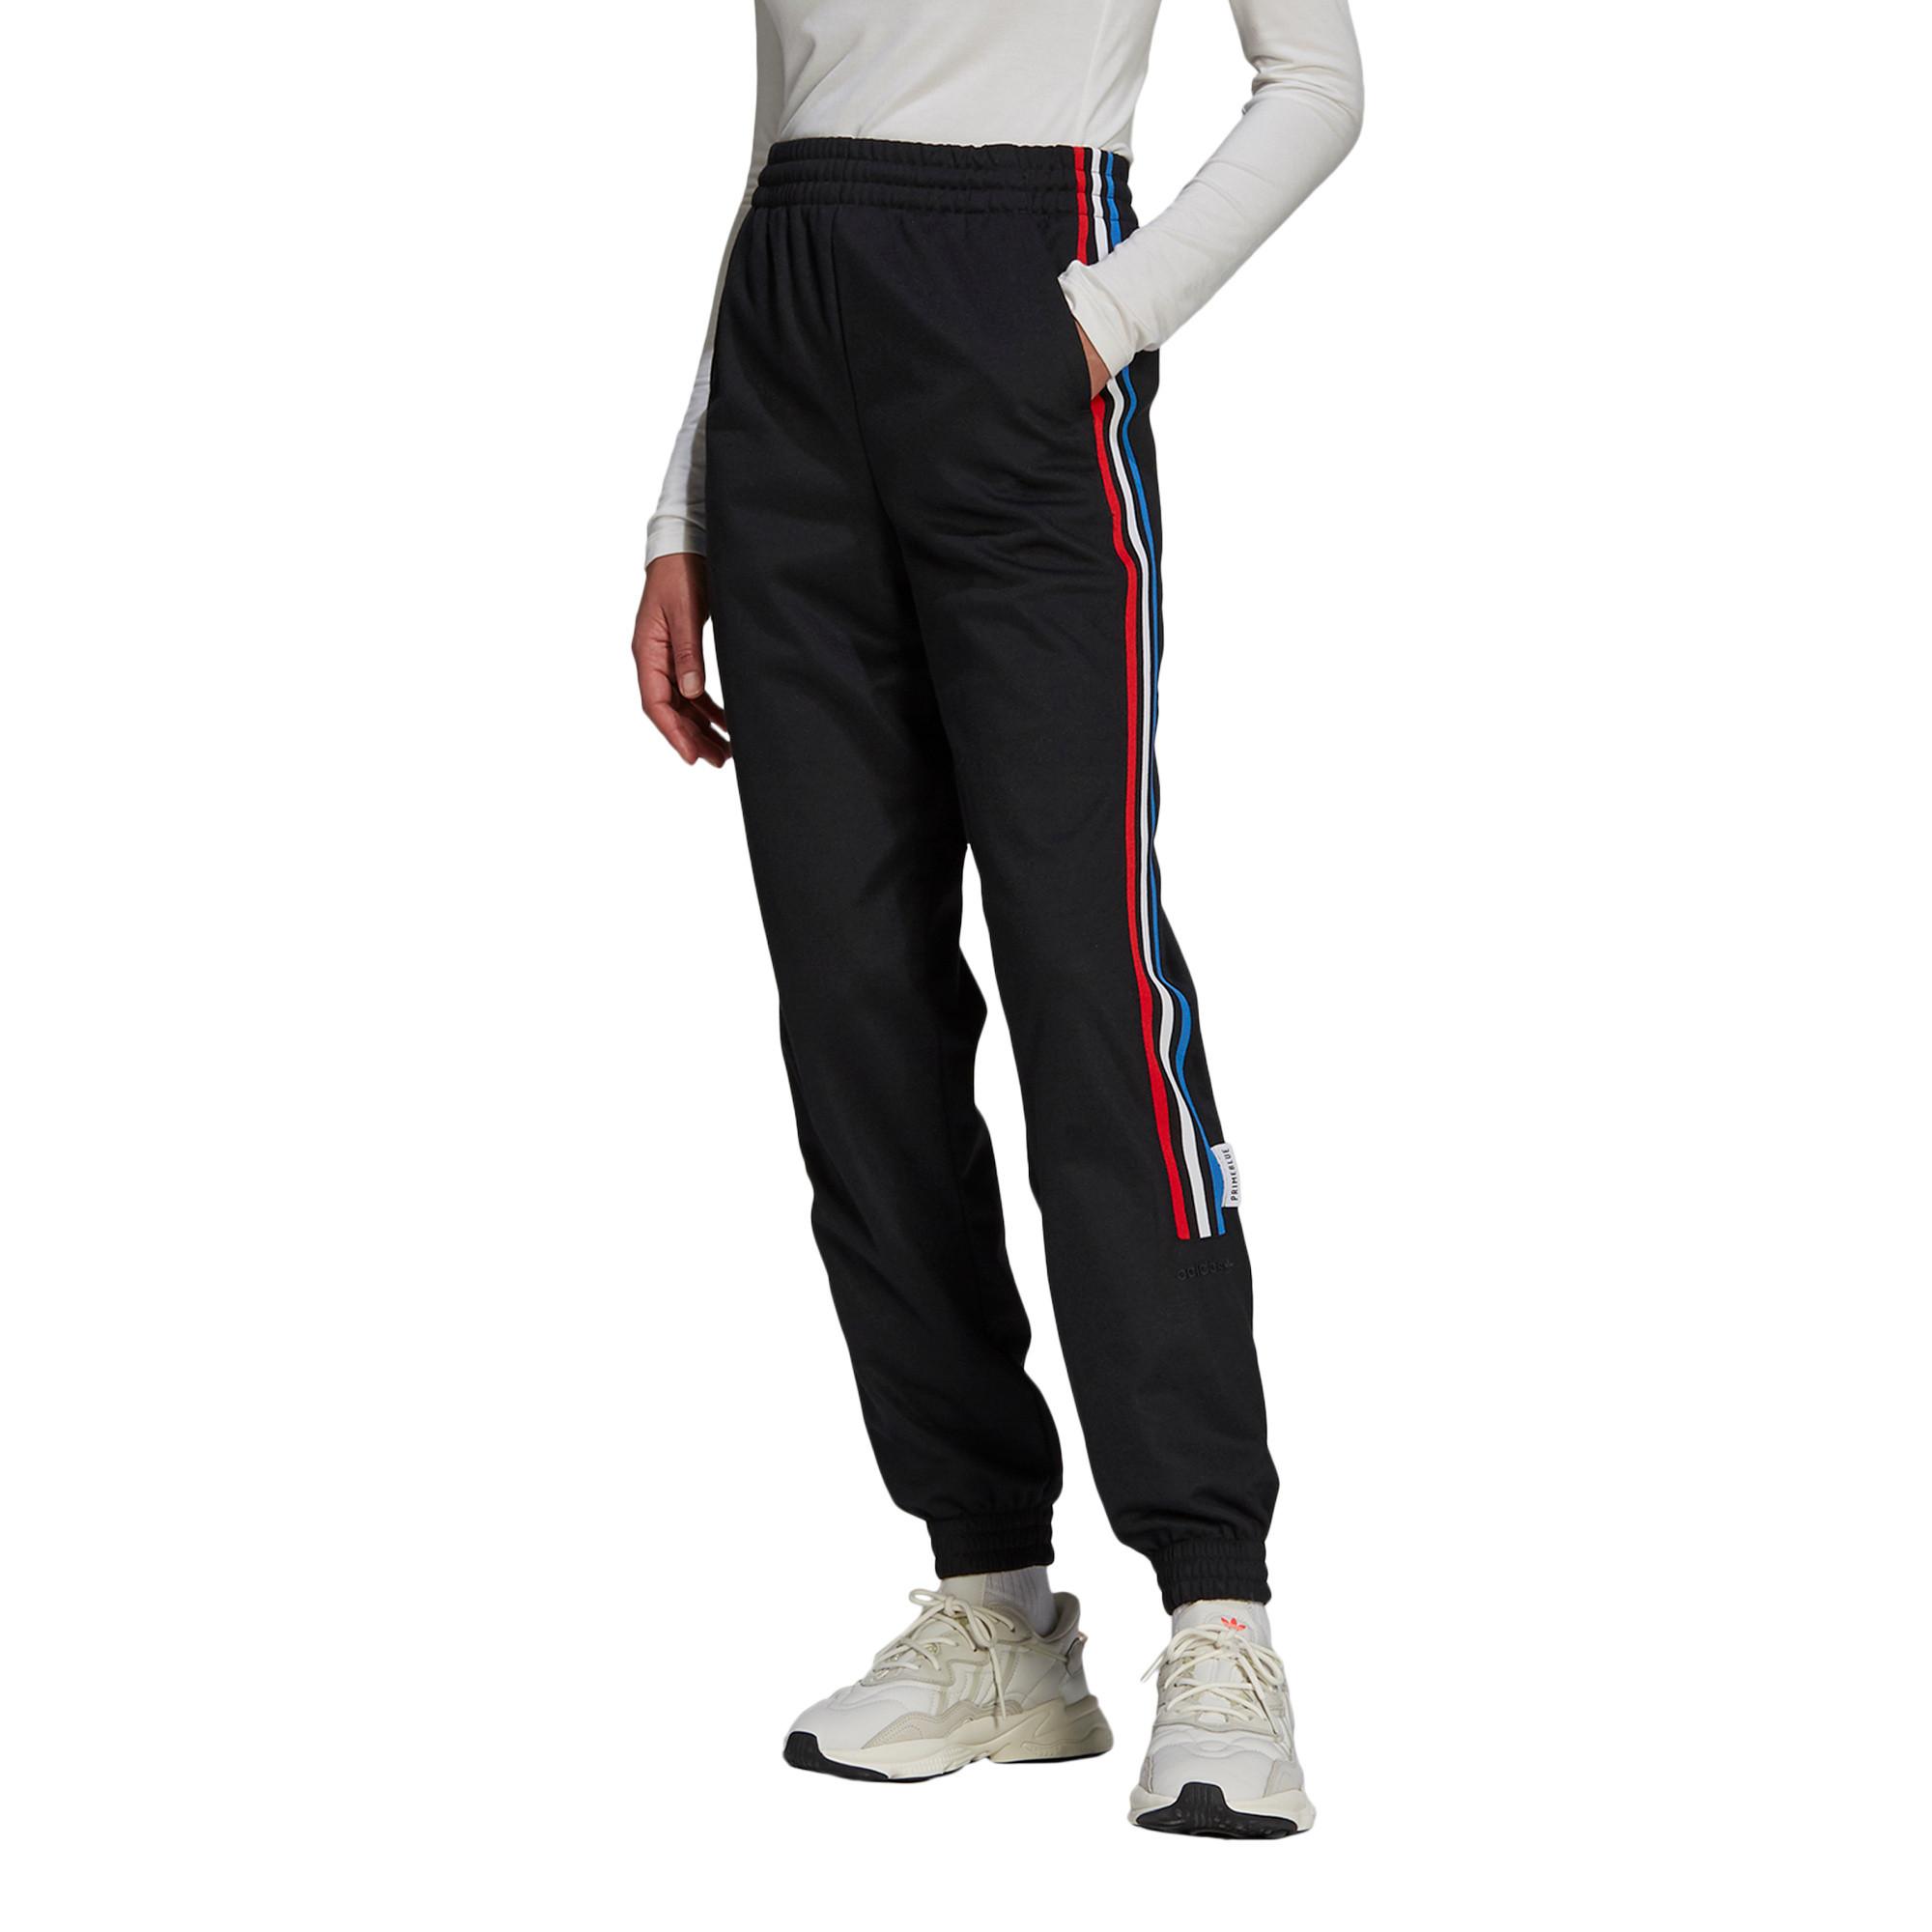 Pantaloni tuta adicolor Tricolor Primeblue, Nero, large image number 4